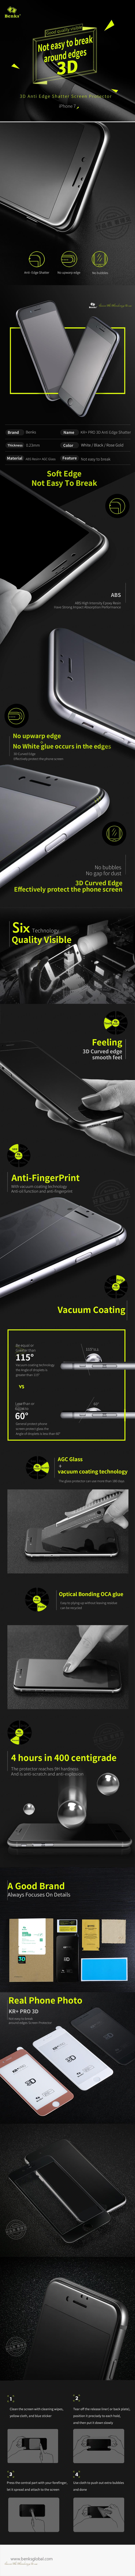 szkło hartowane do iphonea 6s